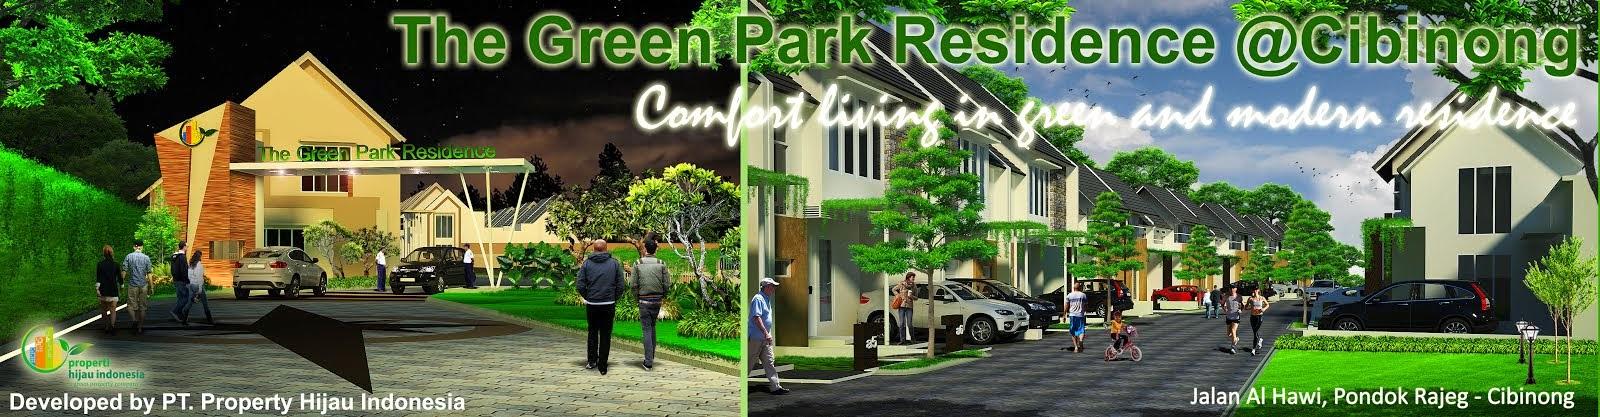 The Green Park Residence